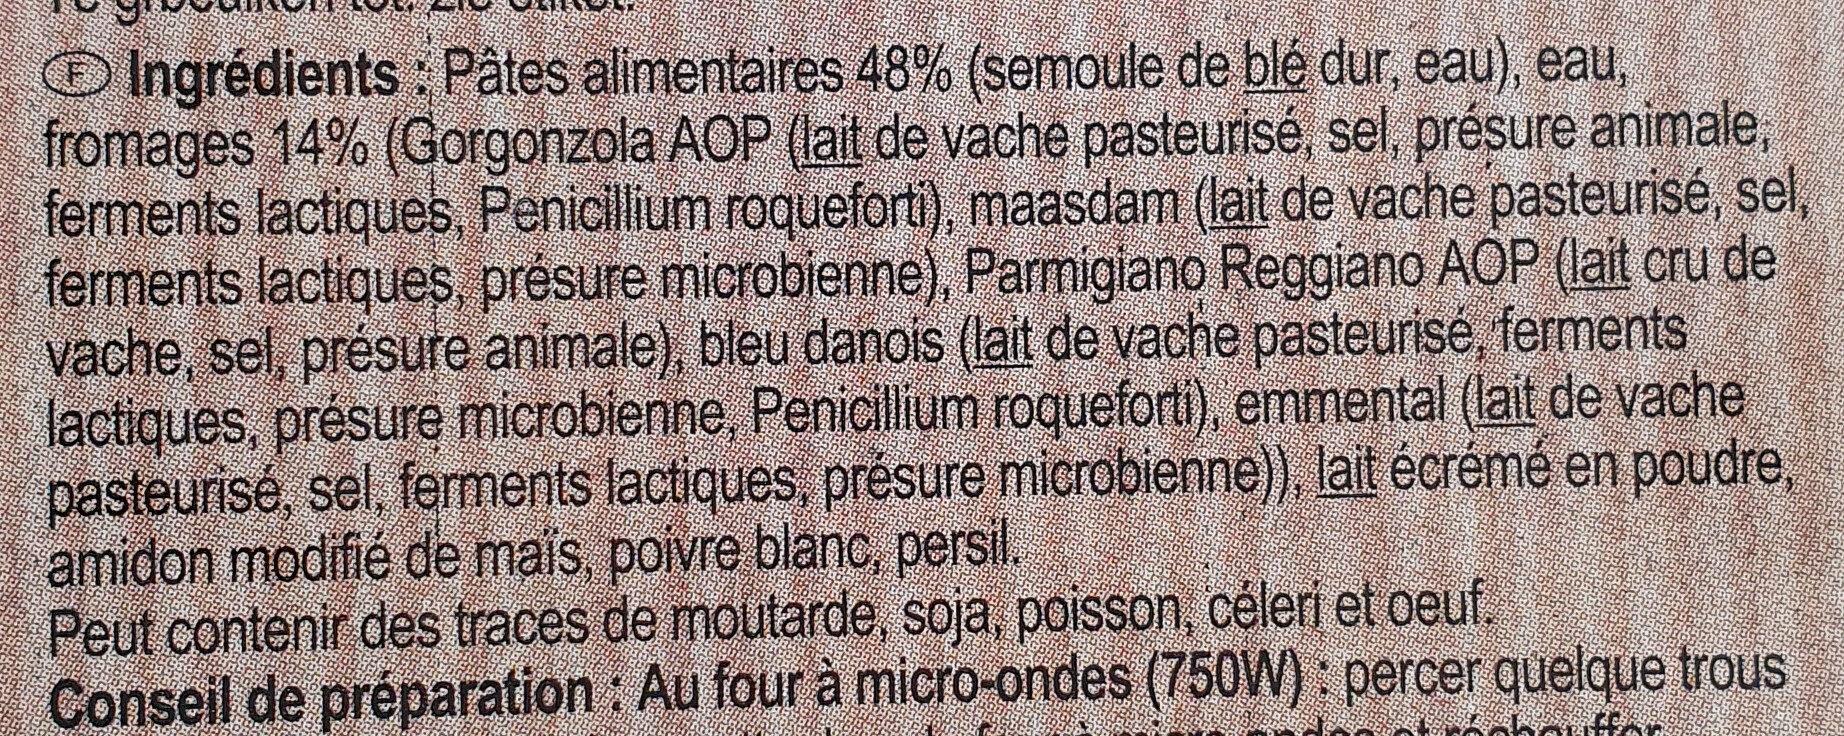 Penne 5 Formaggi - Ingrediënten